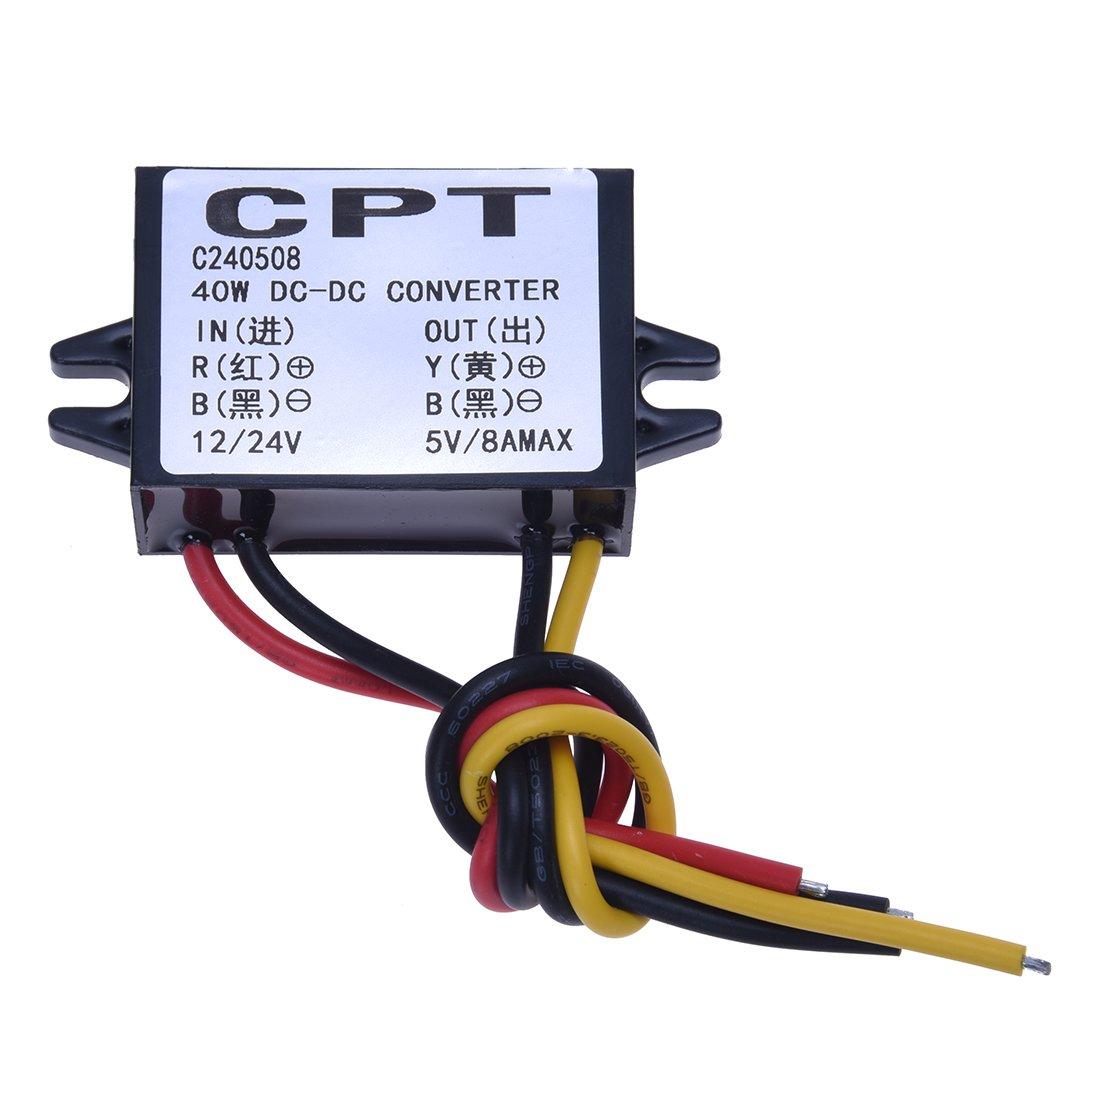 SODIAL(R) Convertisseurs electriques DC Converter Regulator 12V 24V Step down to 5V 8A Power Module DCCON-C8